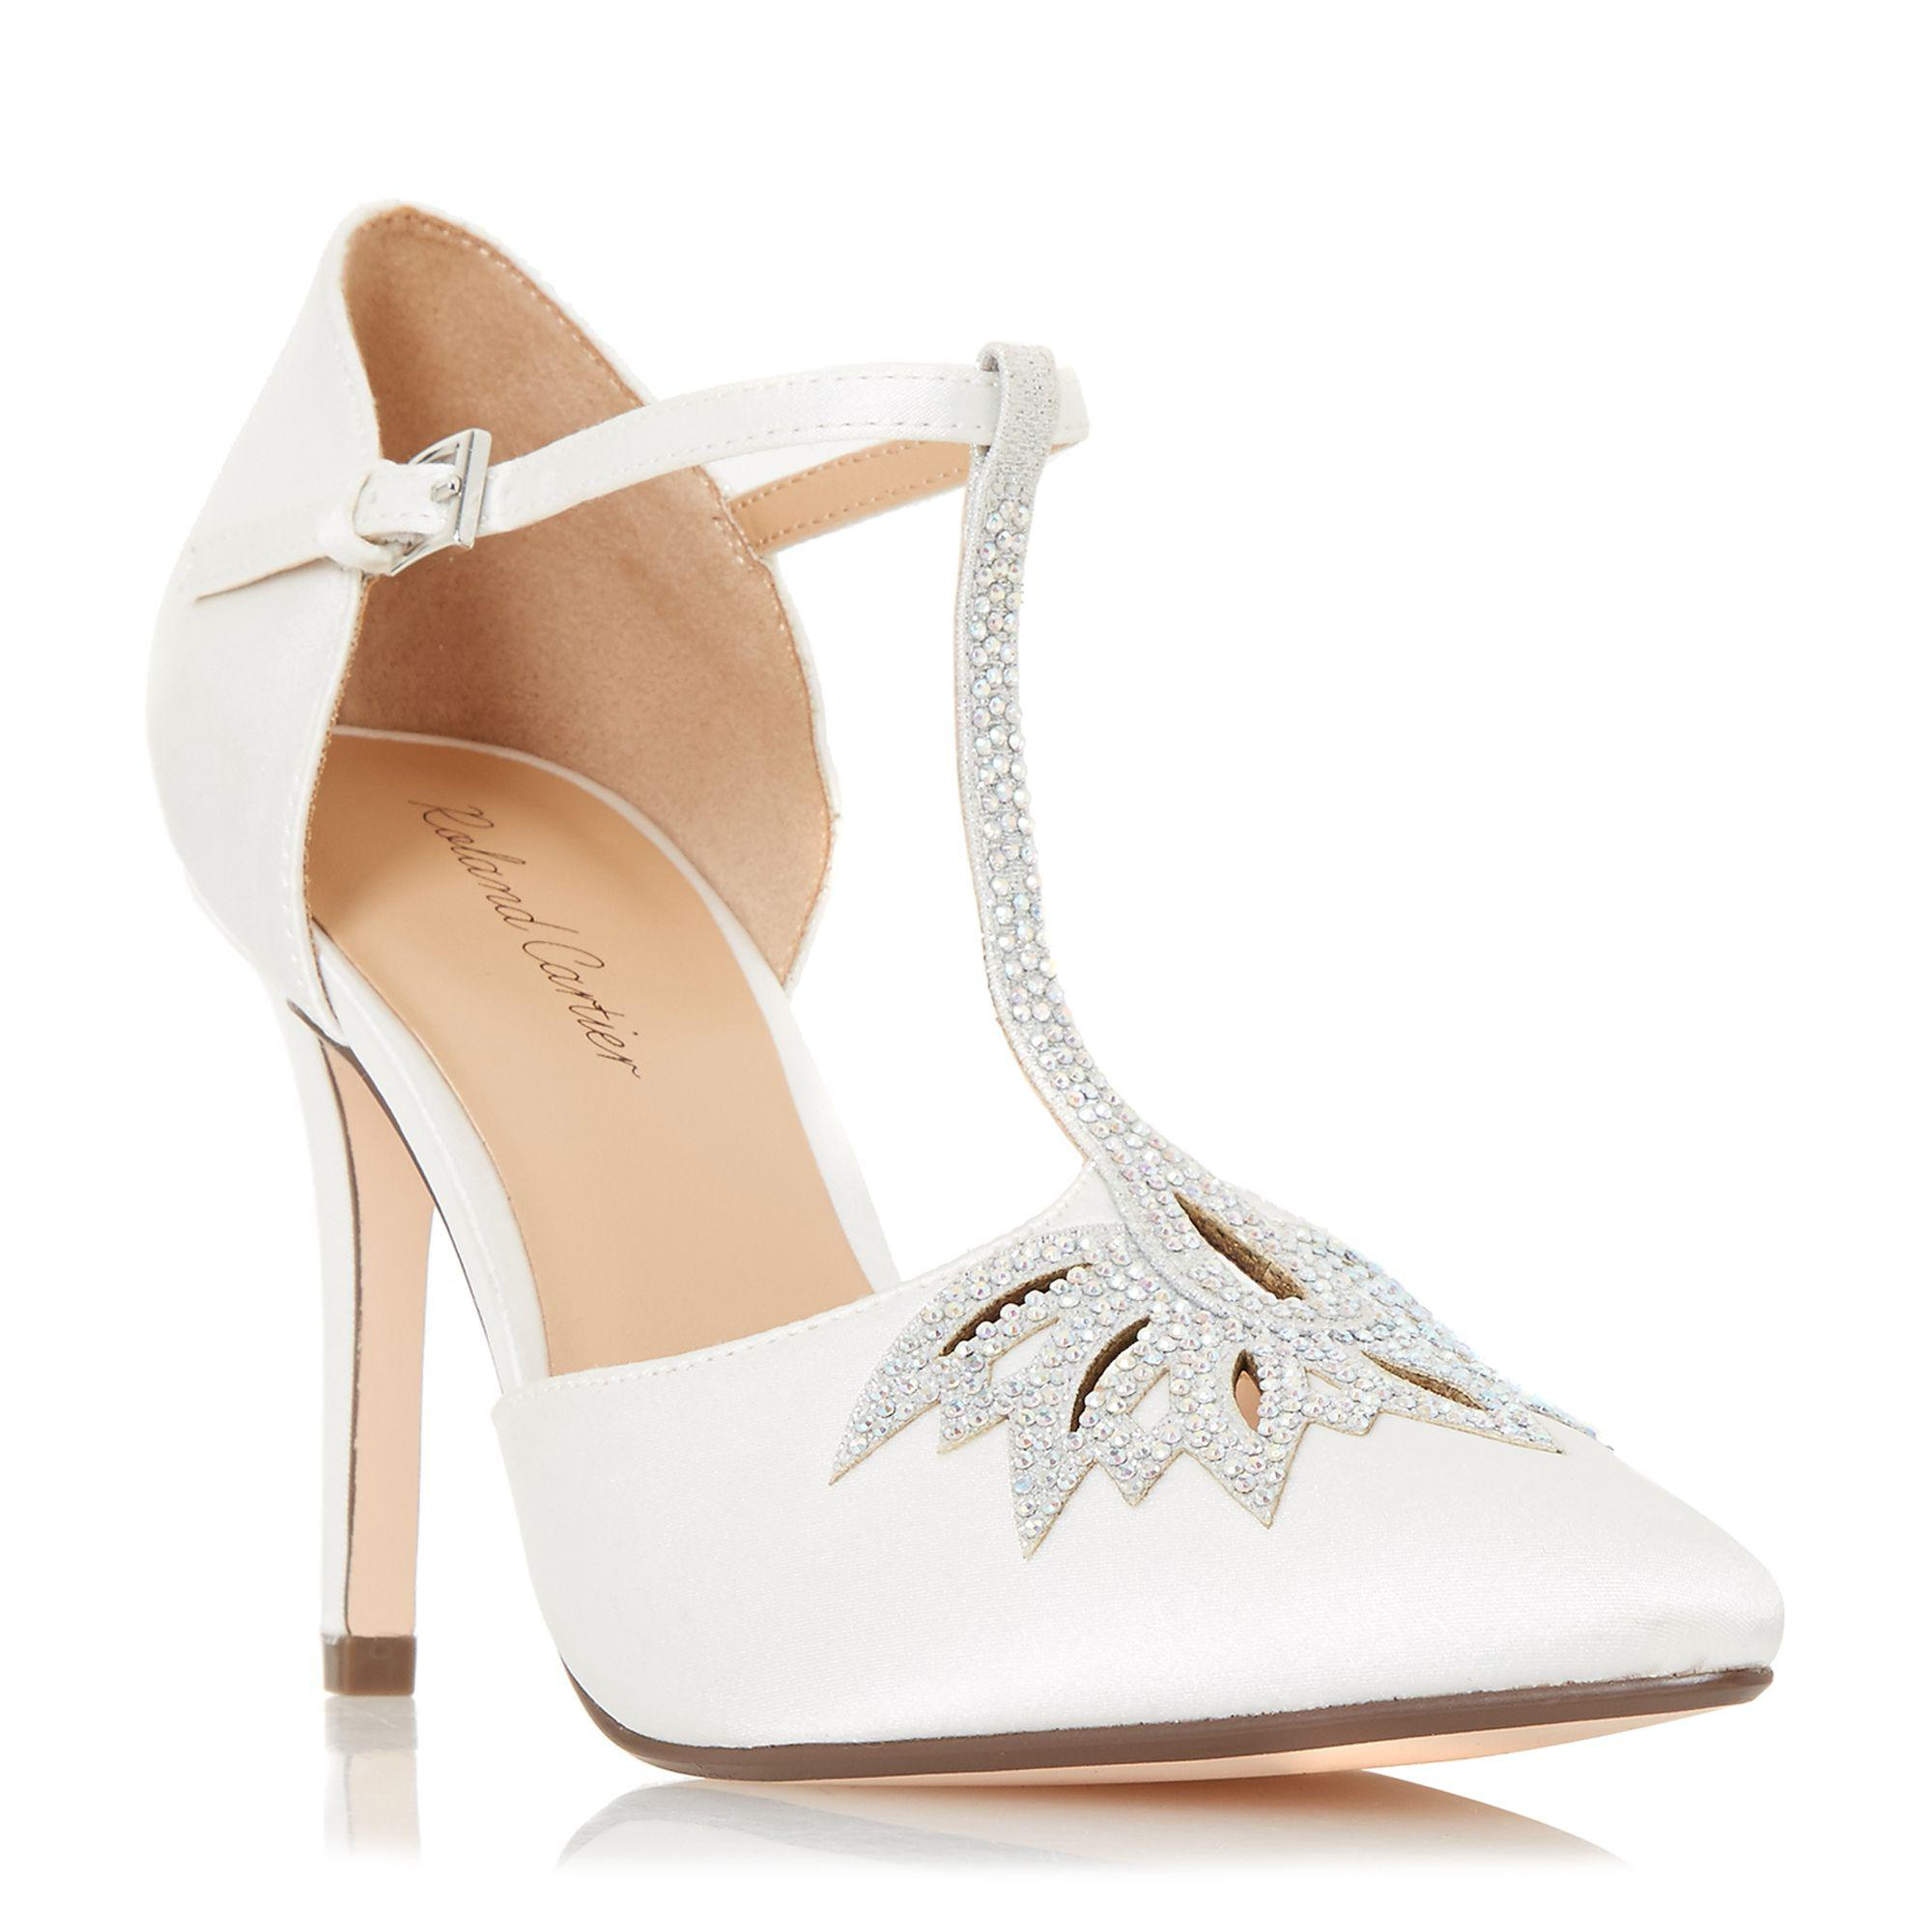 87d0c85fa8f Roland Cartier Ivory  denira  High Stiletto Heel Court Shoes in ...